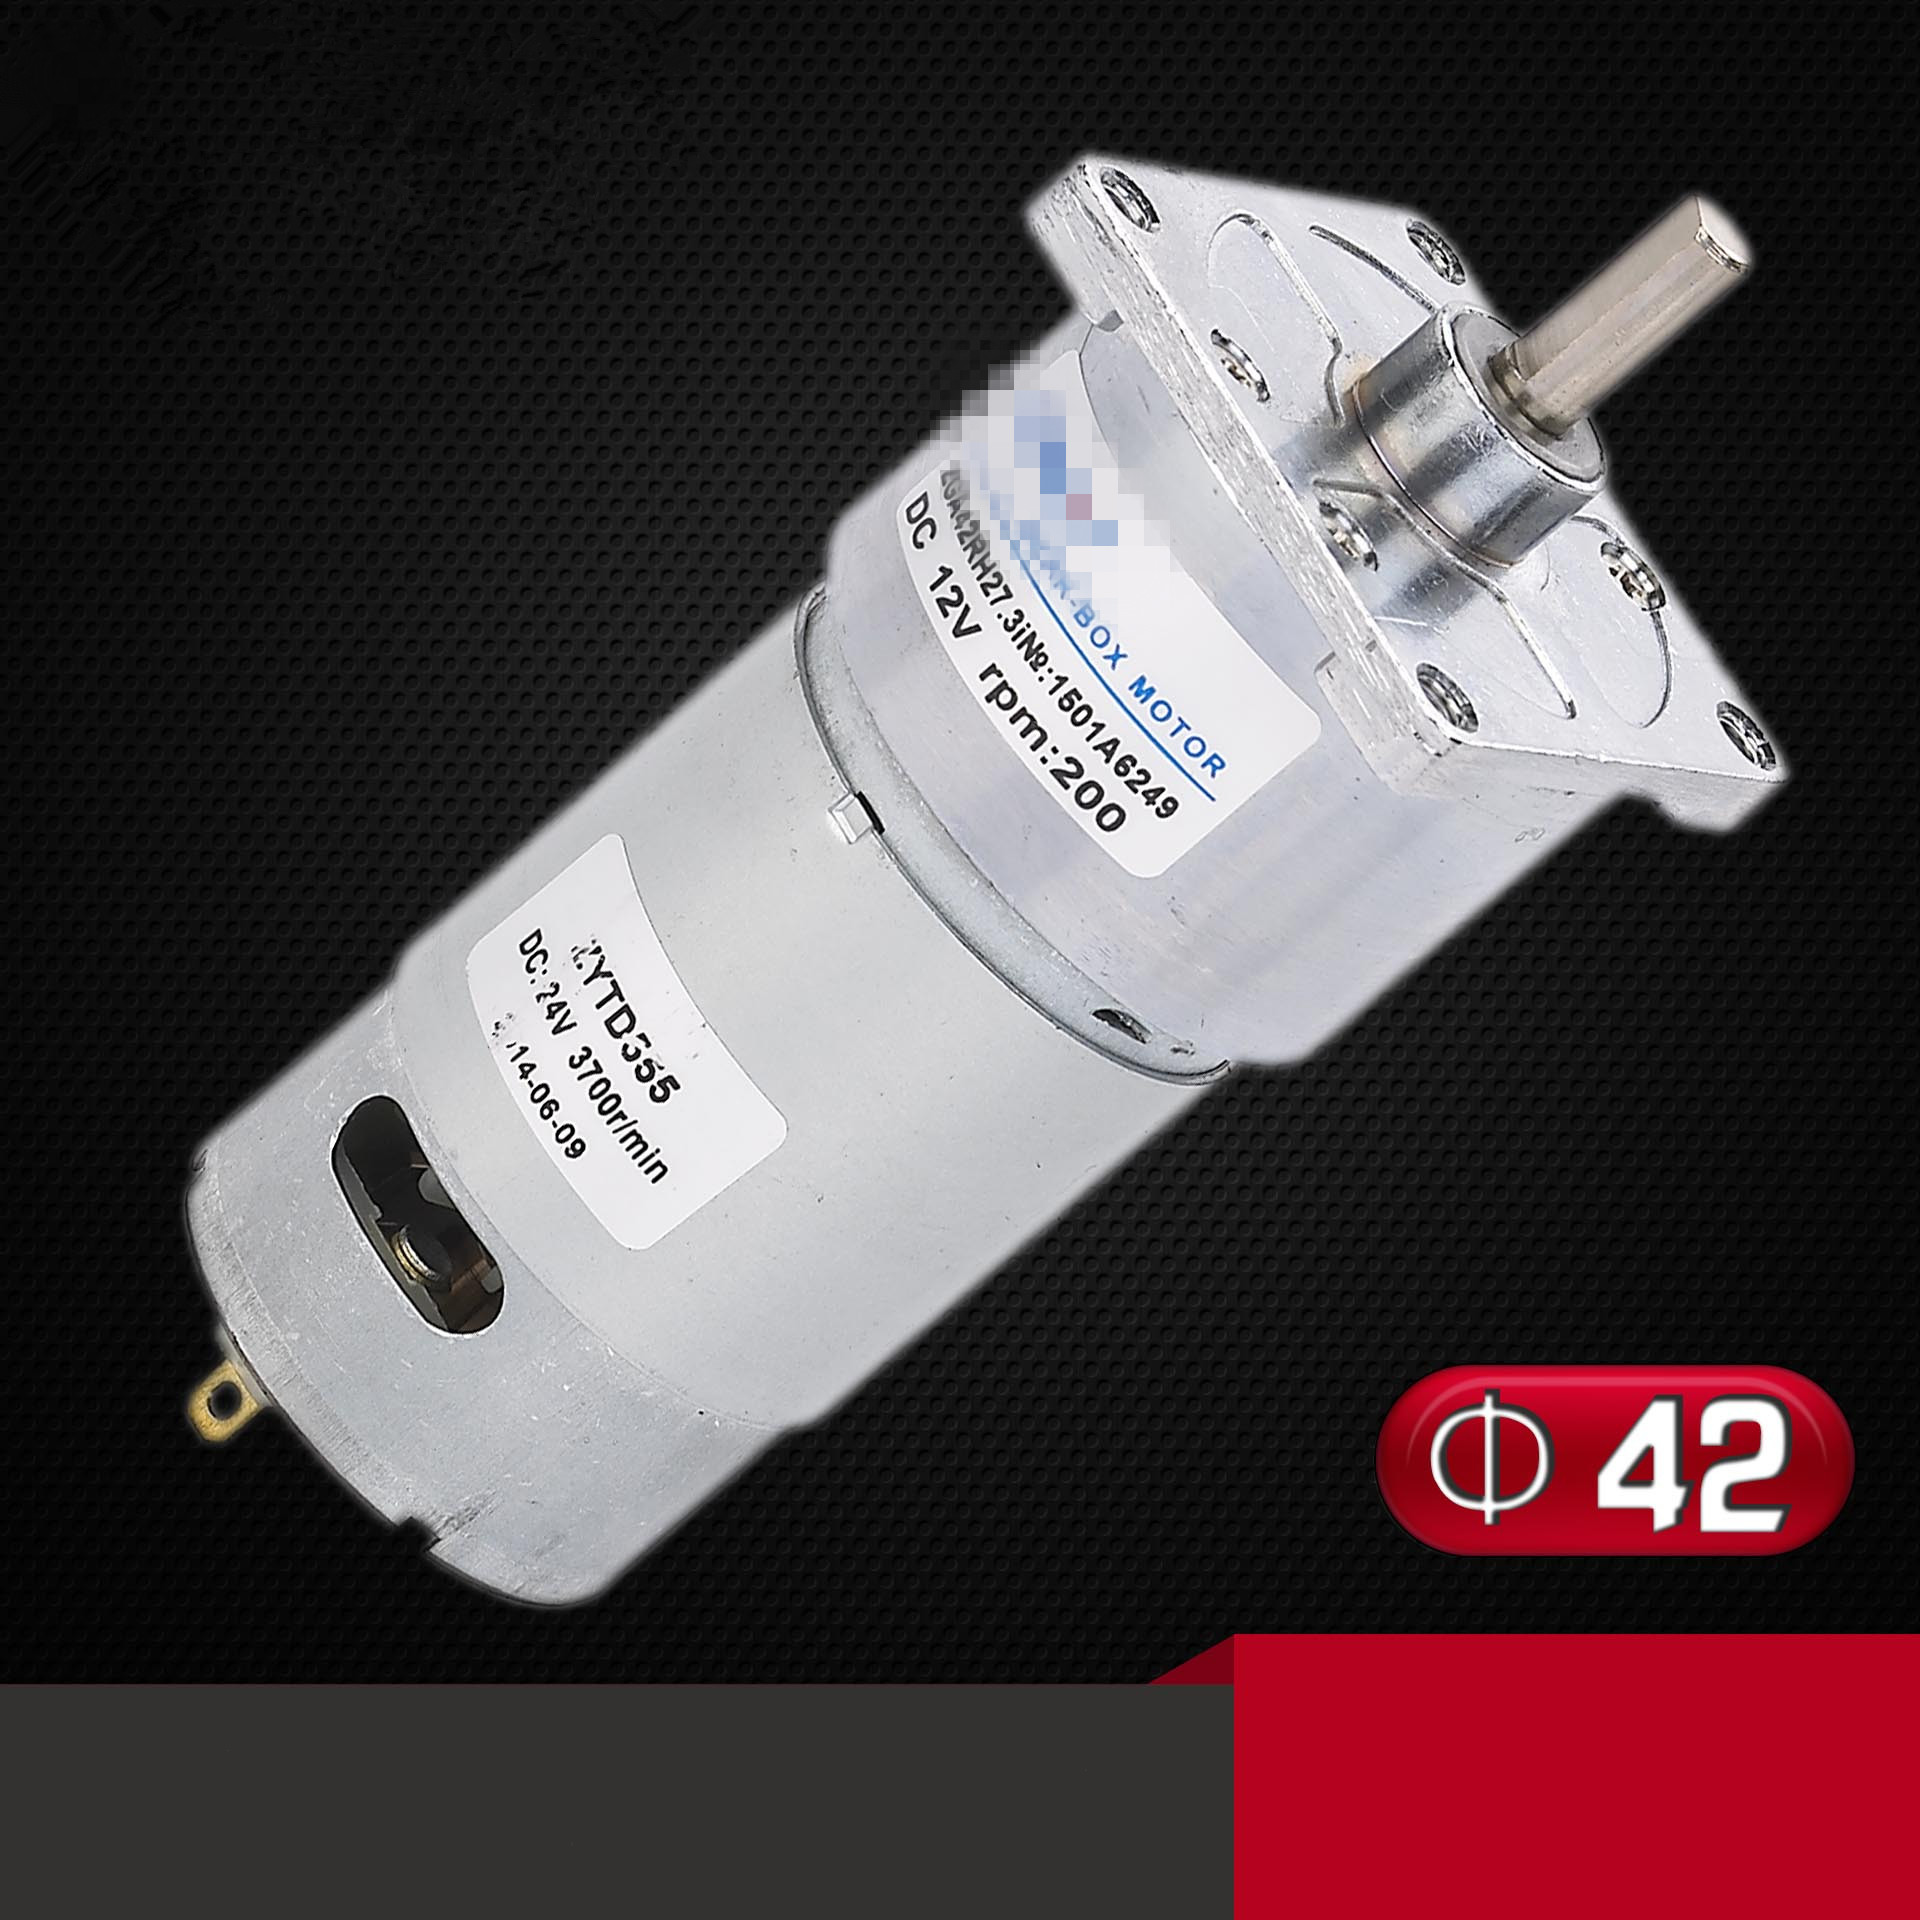 ZGA42FH DC Geared Motor 42mm DIA Square Clamshell DC 12V 24V Output Shaft Center 10RPM-750RPM zga37rh dc 24v 25rpm 6mm shaft dia cylinder permanent magnet geared box motor